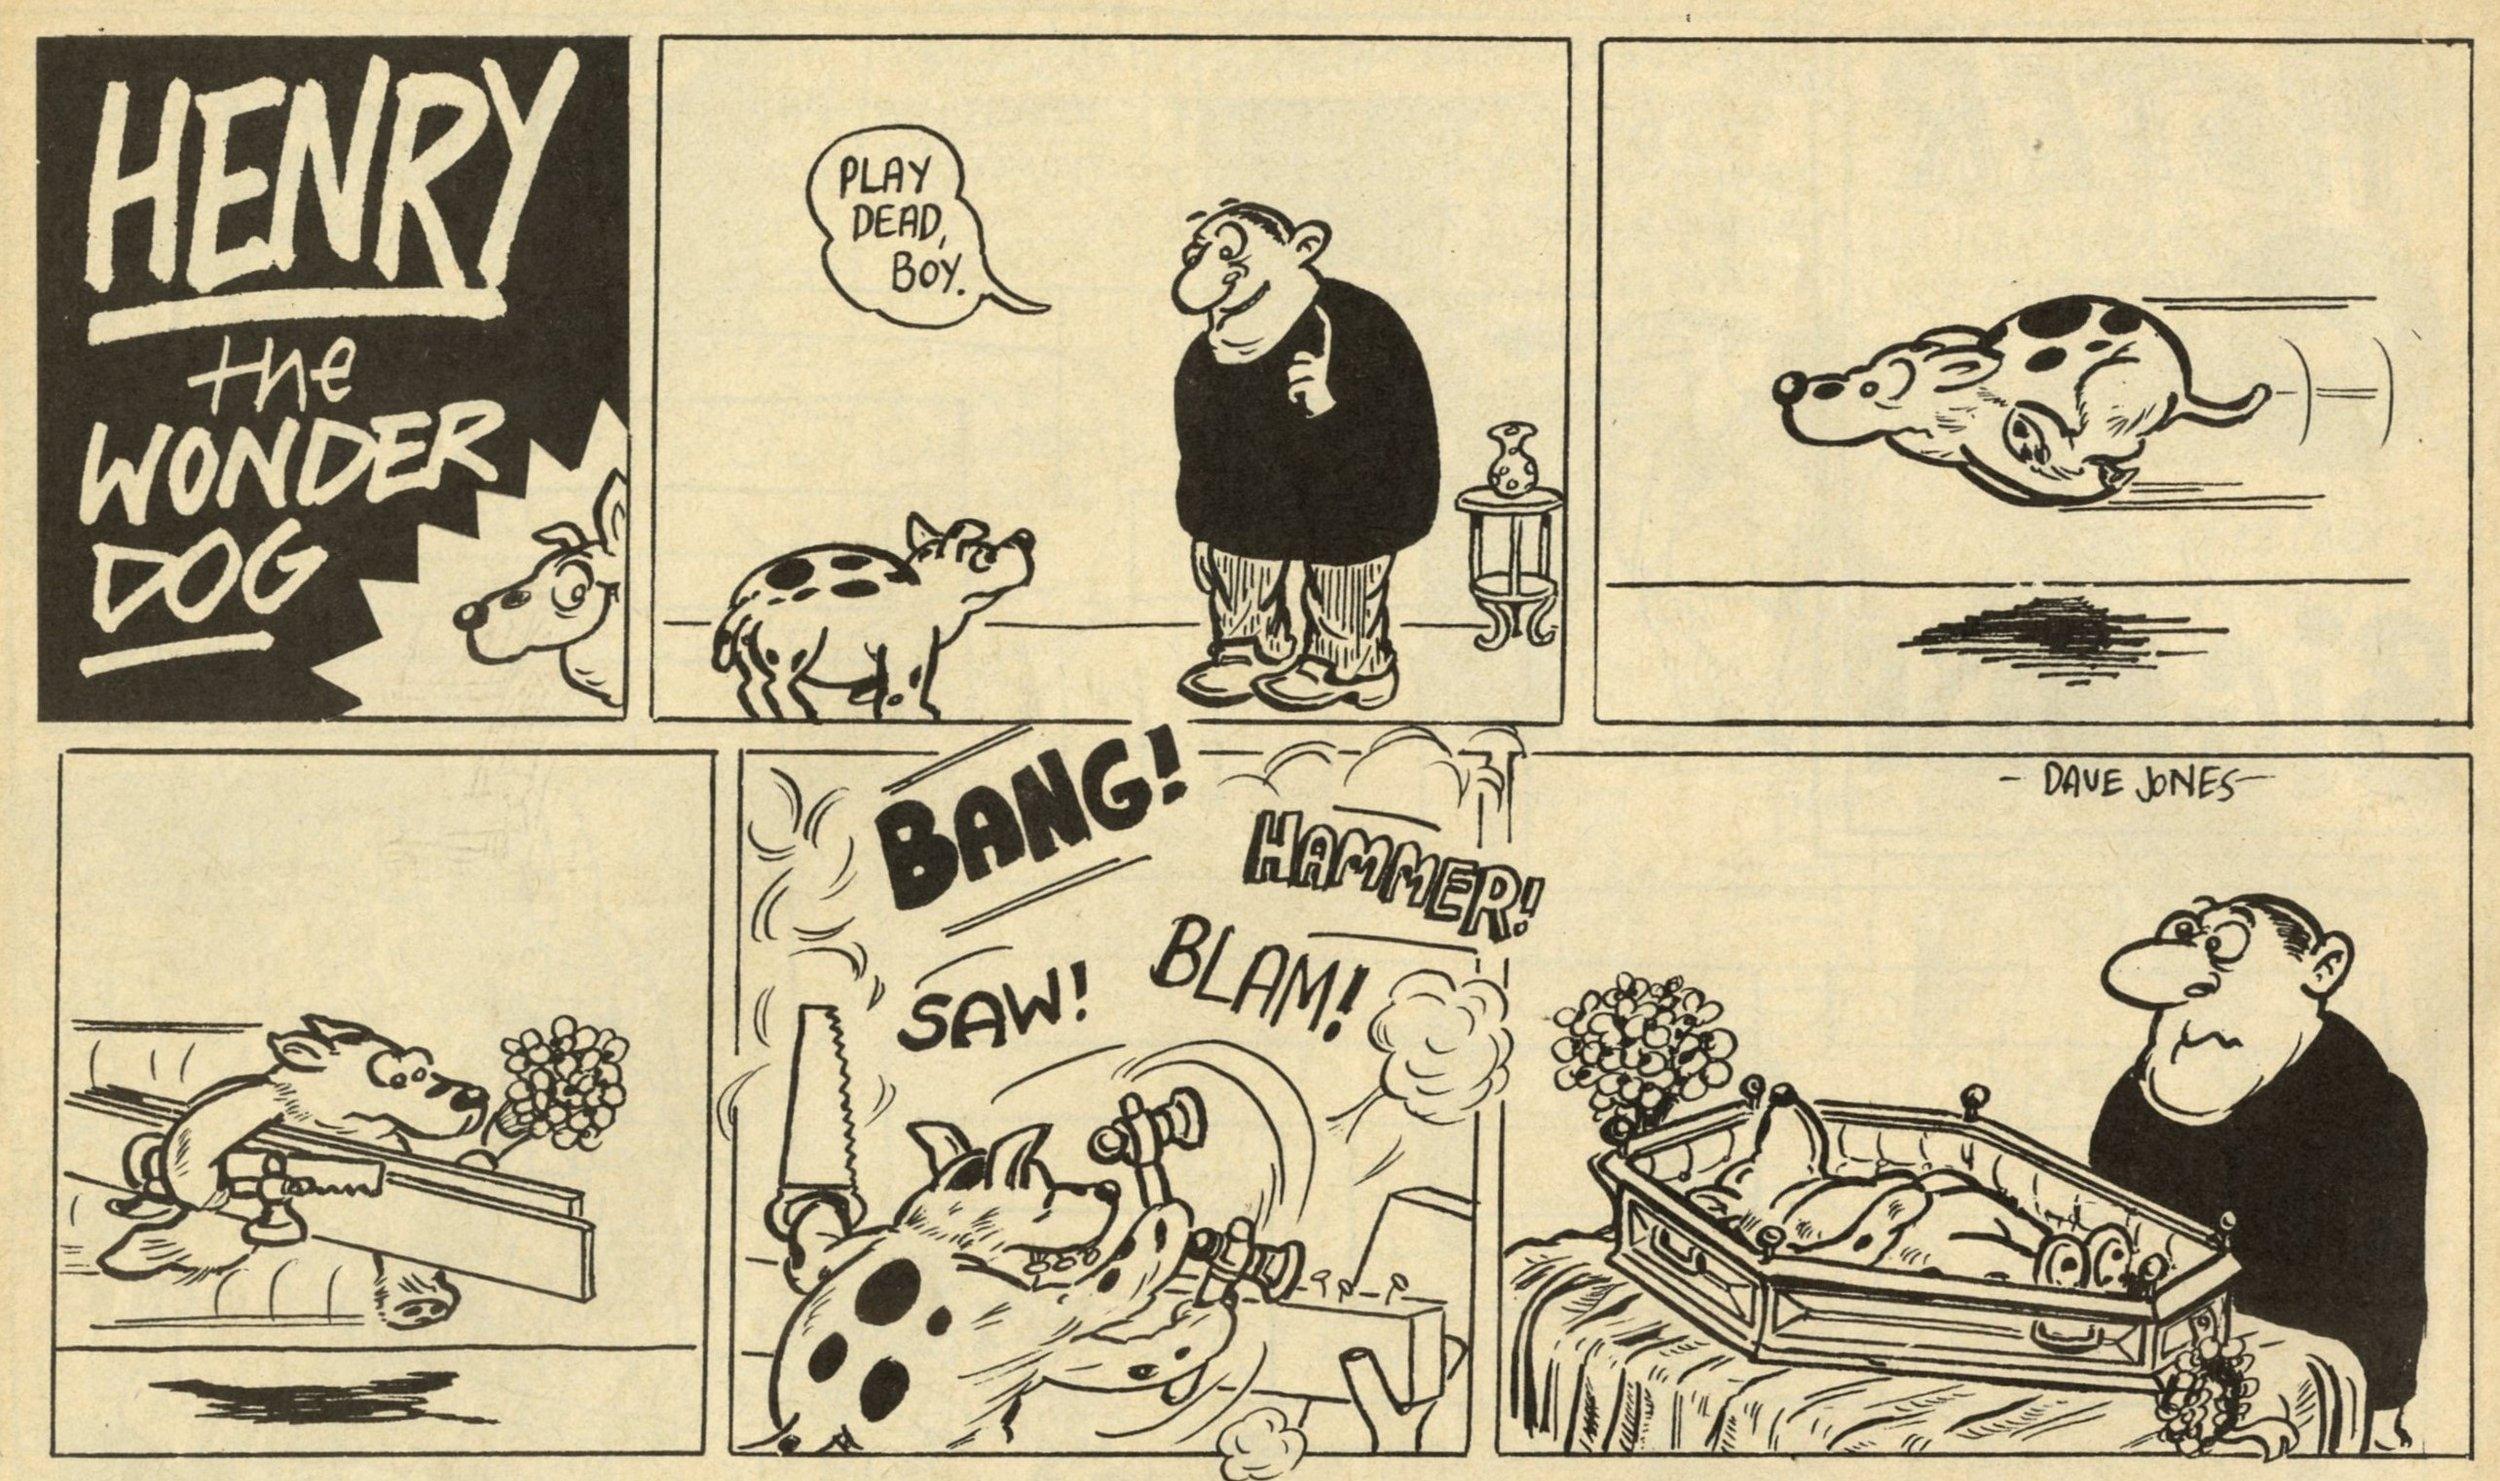 Henry the Wonder Dog: Dave Jones (artist)